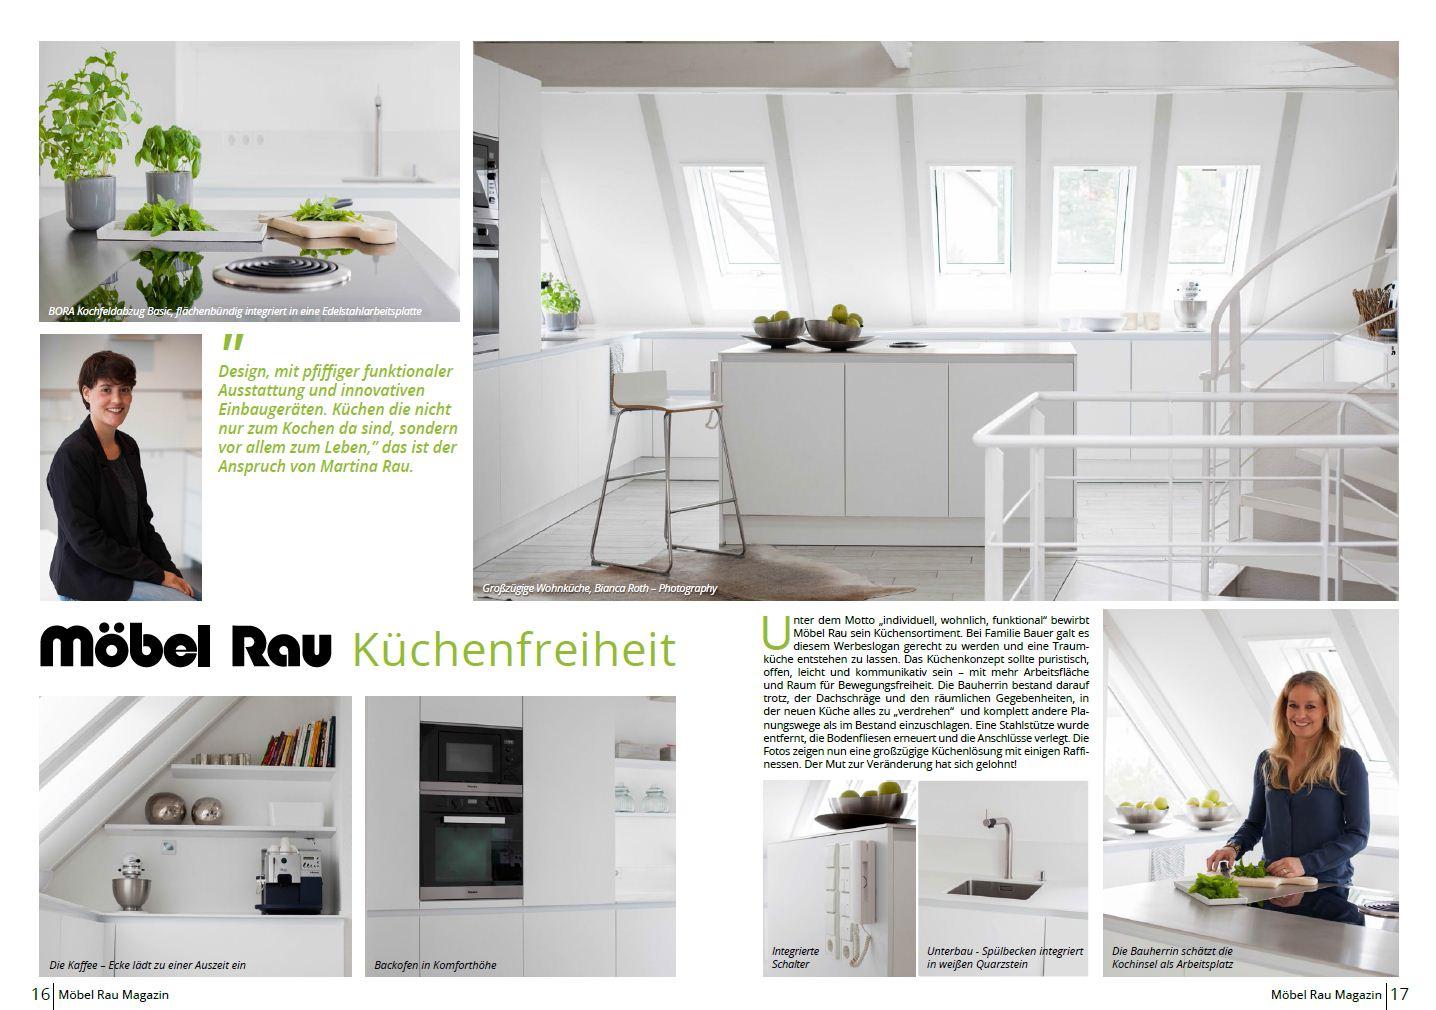 M Bel Rau möbel rau magazin roth photography